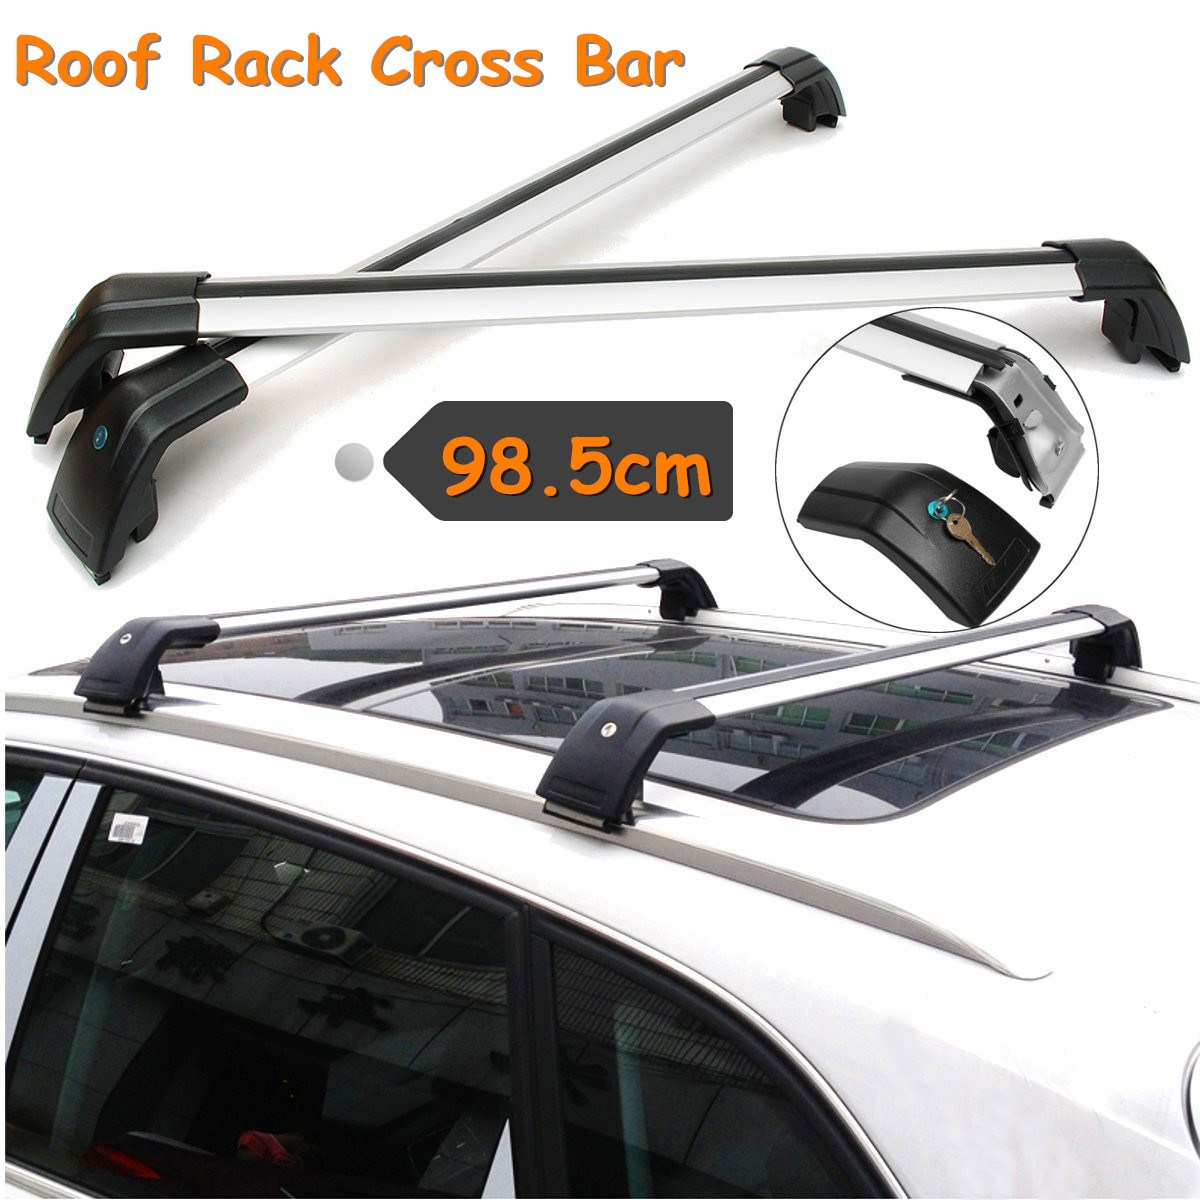 For 2009-2017 Dodge Journey Adjustable Top Roof Rack Cross Bar Carrier Luggage